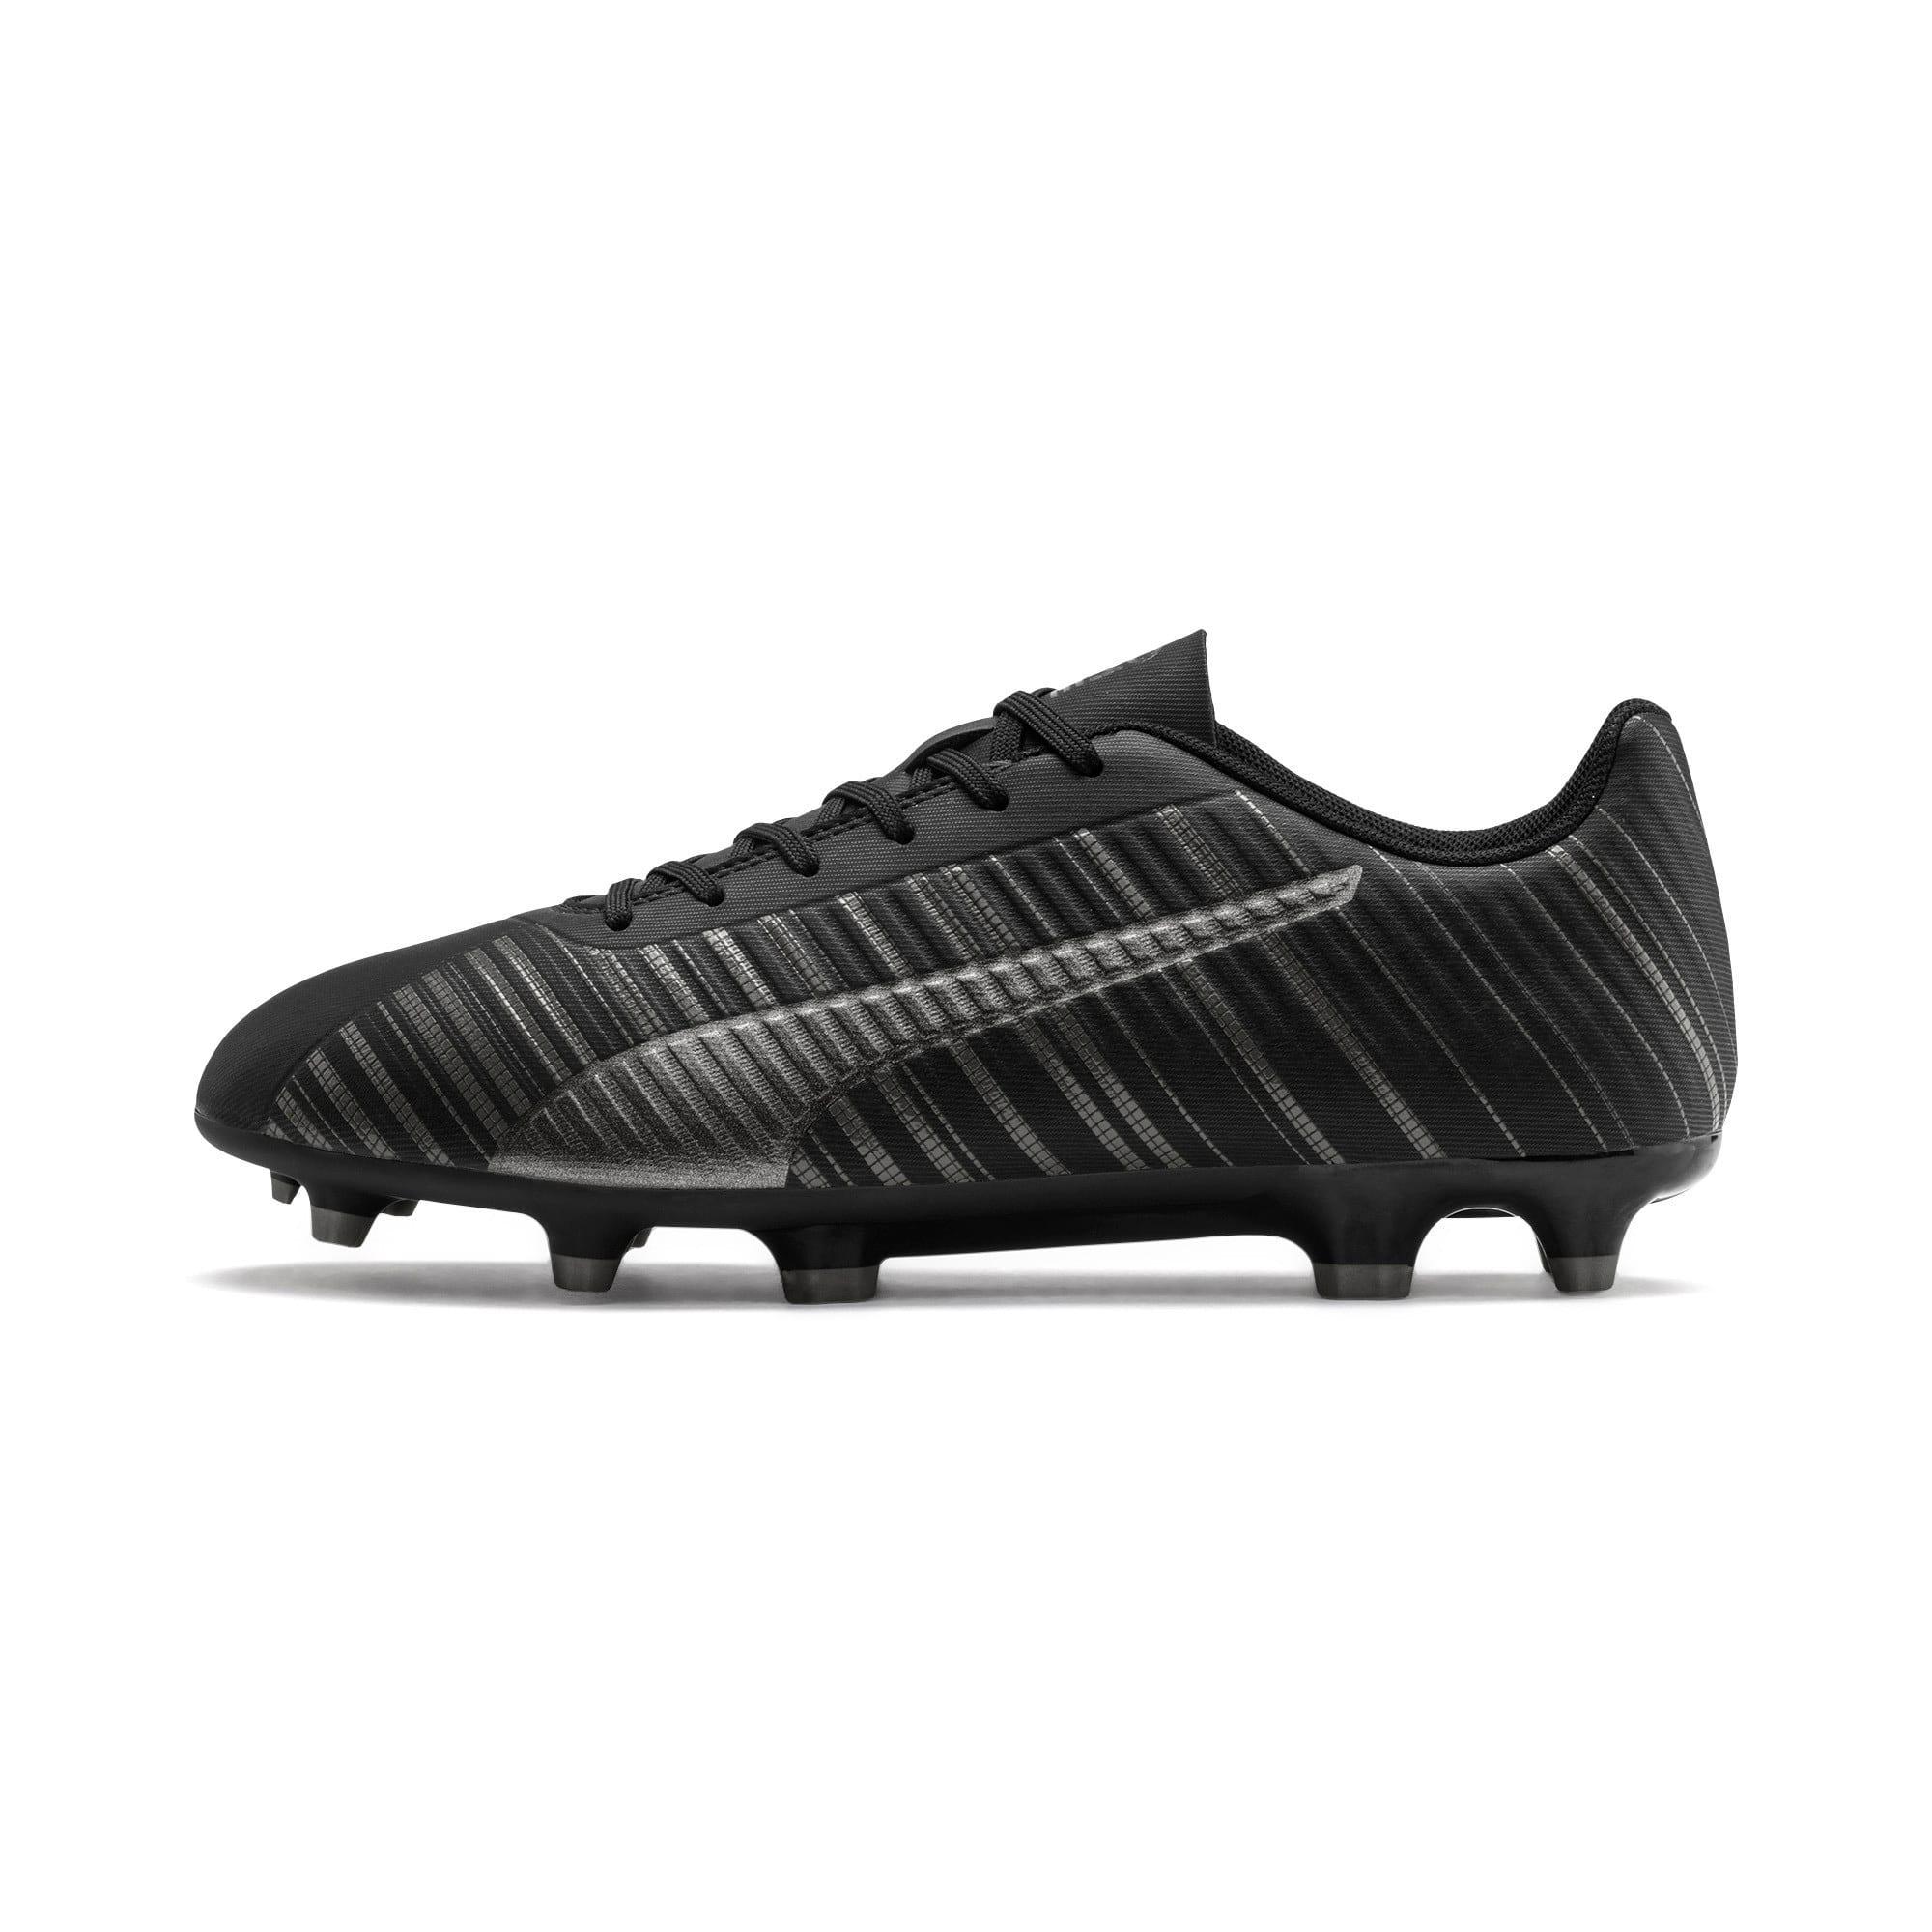 Thumbnail 1 of PUMA ONE 5.4 FG/AG Men's Soccer Cleats, Black-Black-Puma Aged Silver, medium